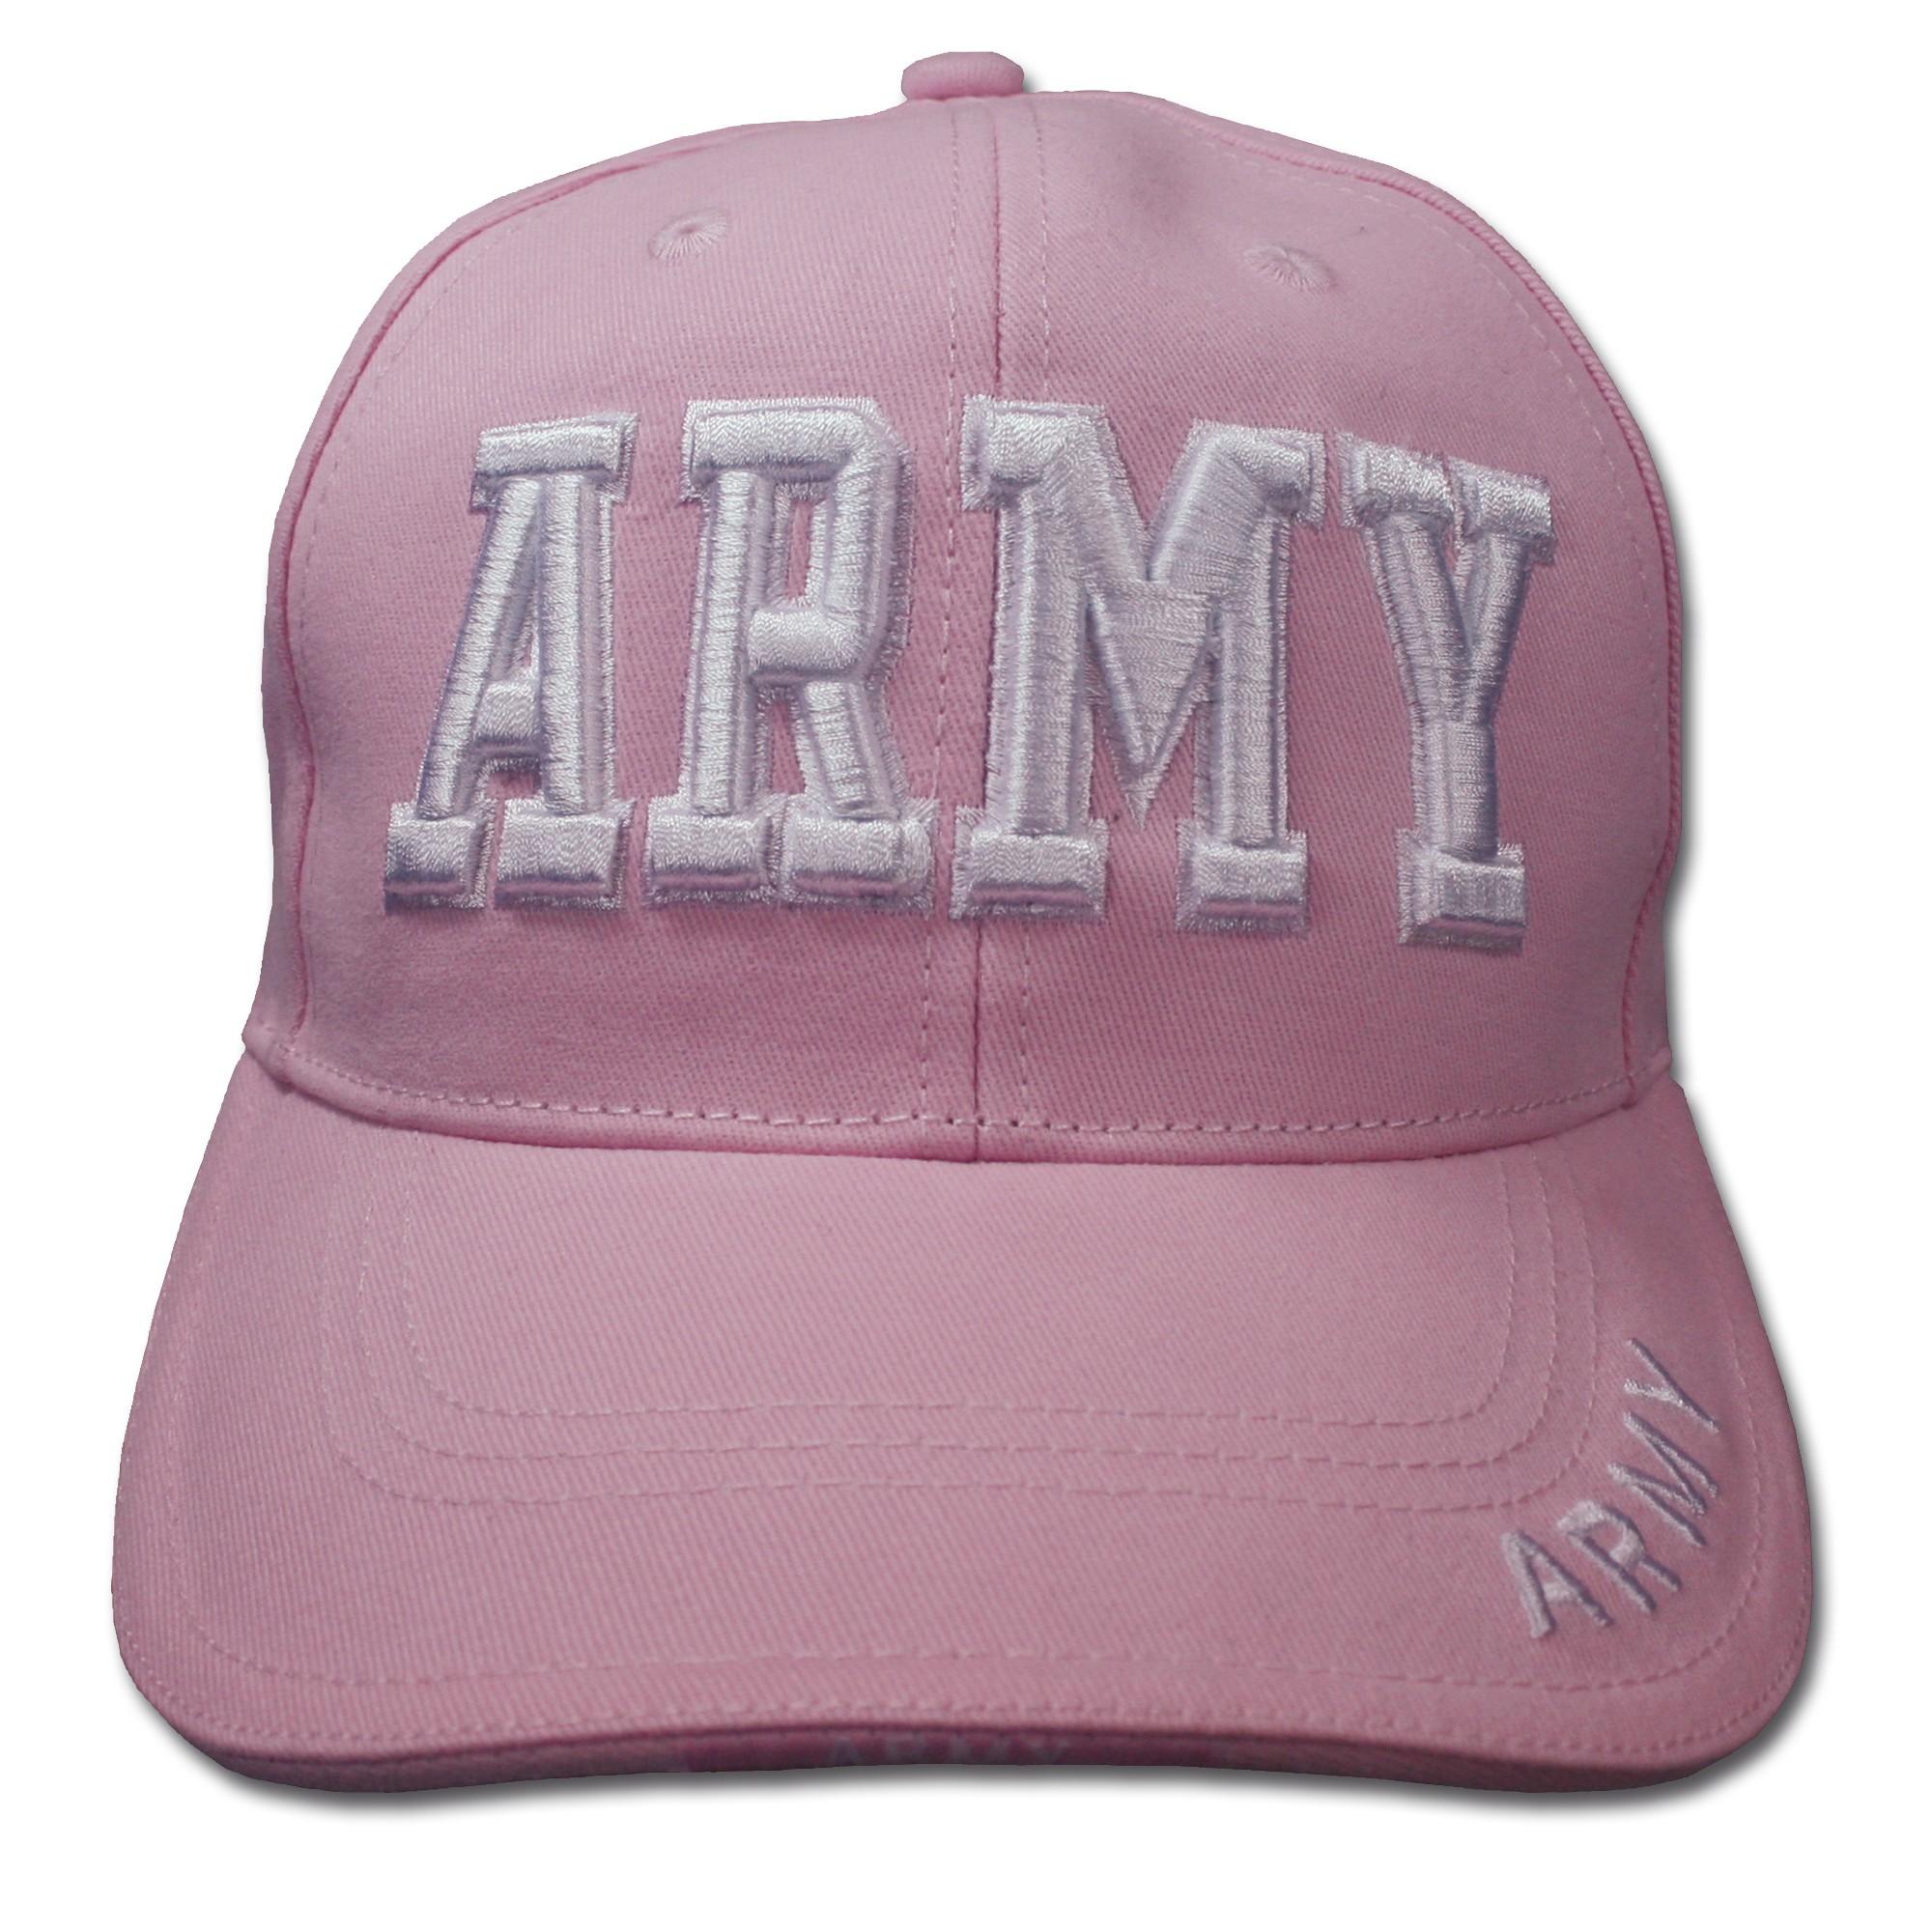 Baseball Cap ARMY pink